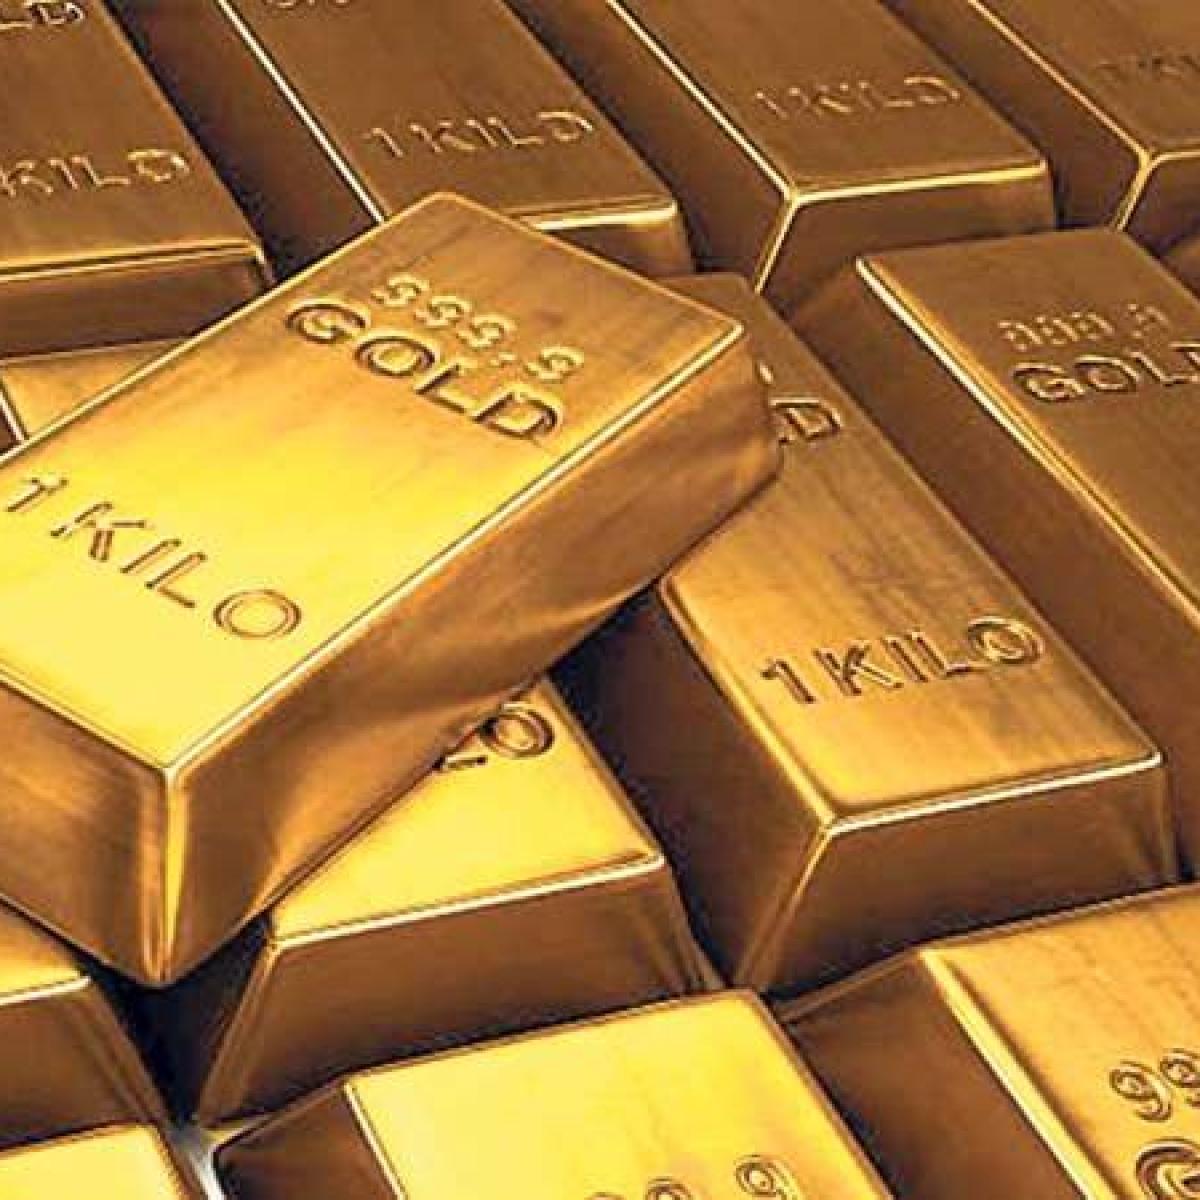 Kerala gold smuggling case: NIA to investigate terror links